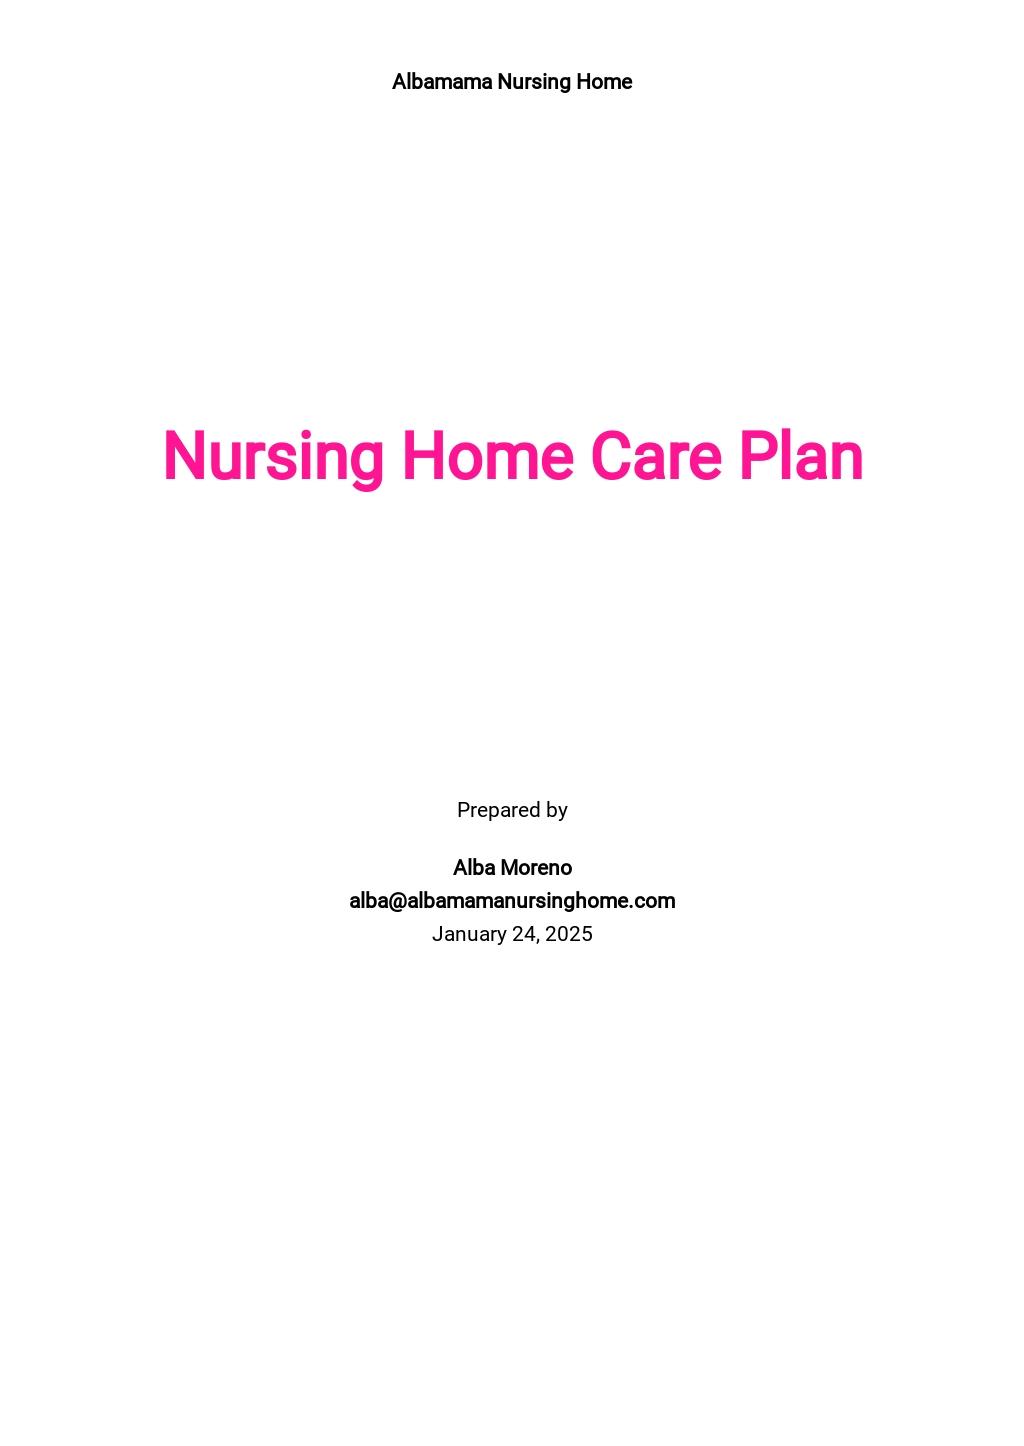 Nursing Home Care Plan Template